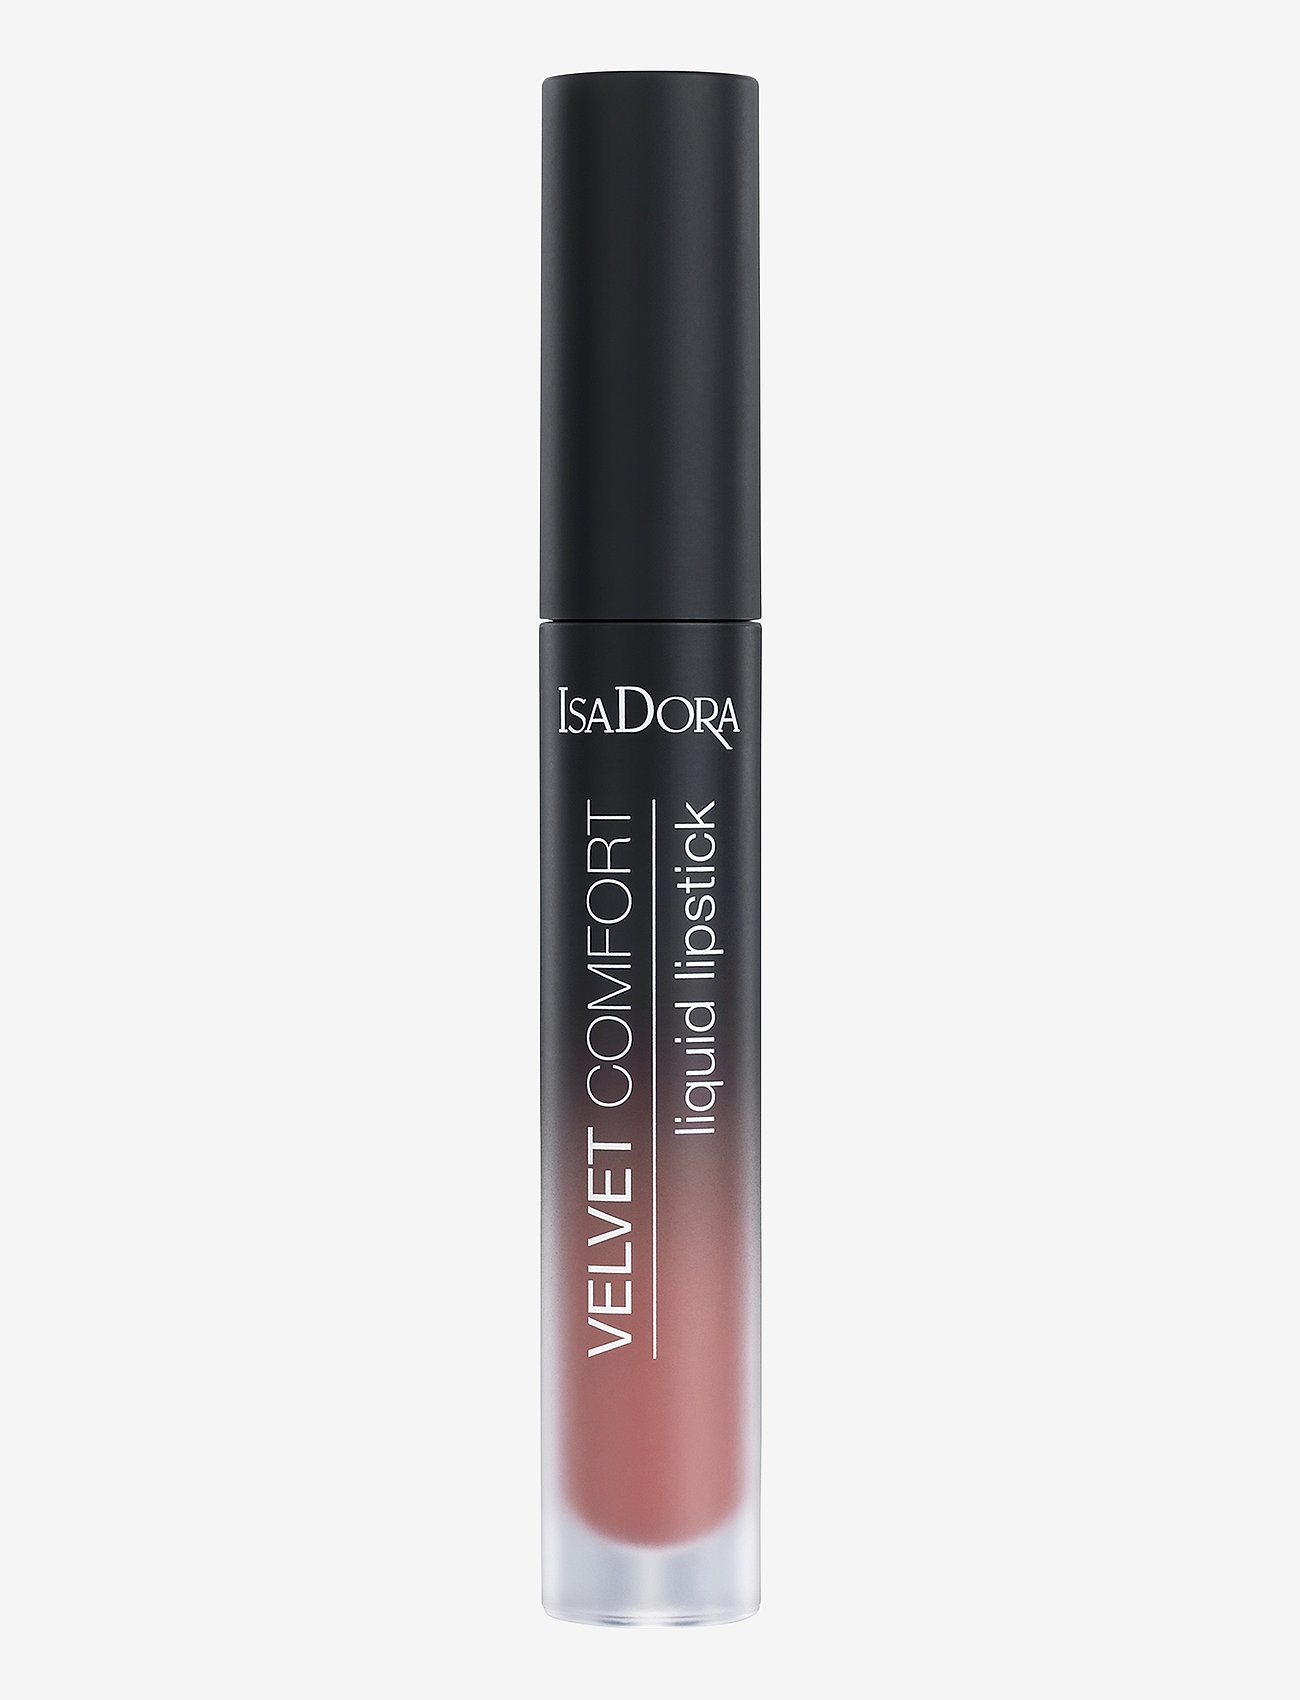 Isadora - Velvet Comfort Liquid Lipstick Coral Rose - liquid lipstick - coral rose - 0